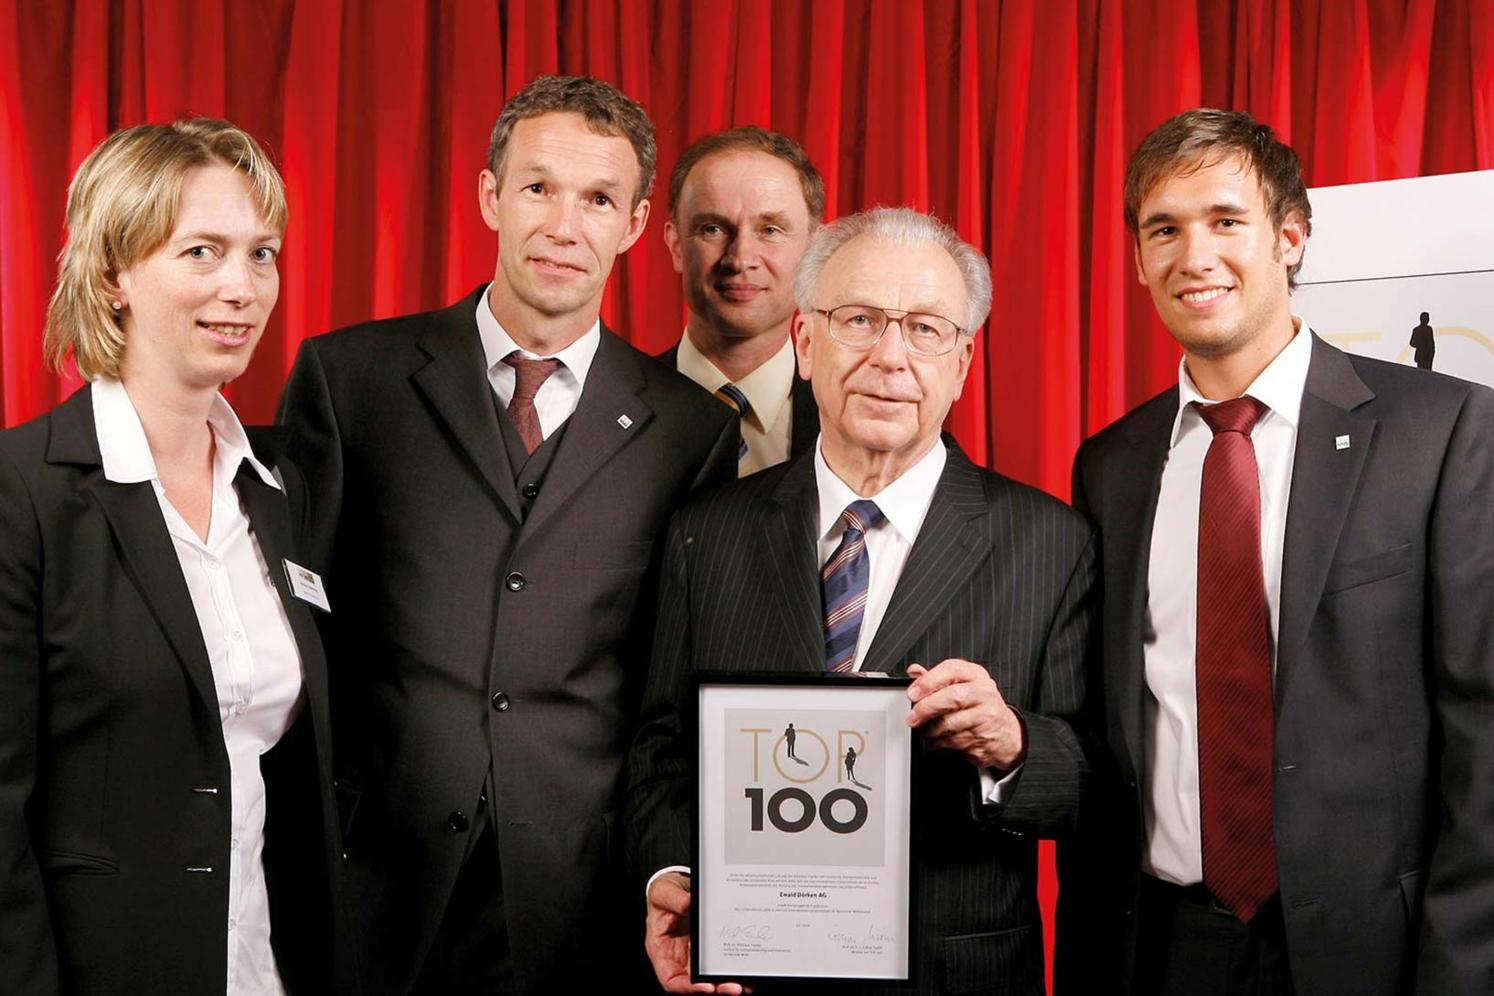 2010 TOP 100 Innovator